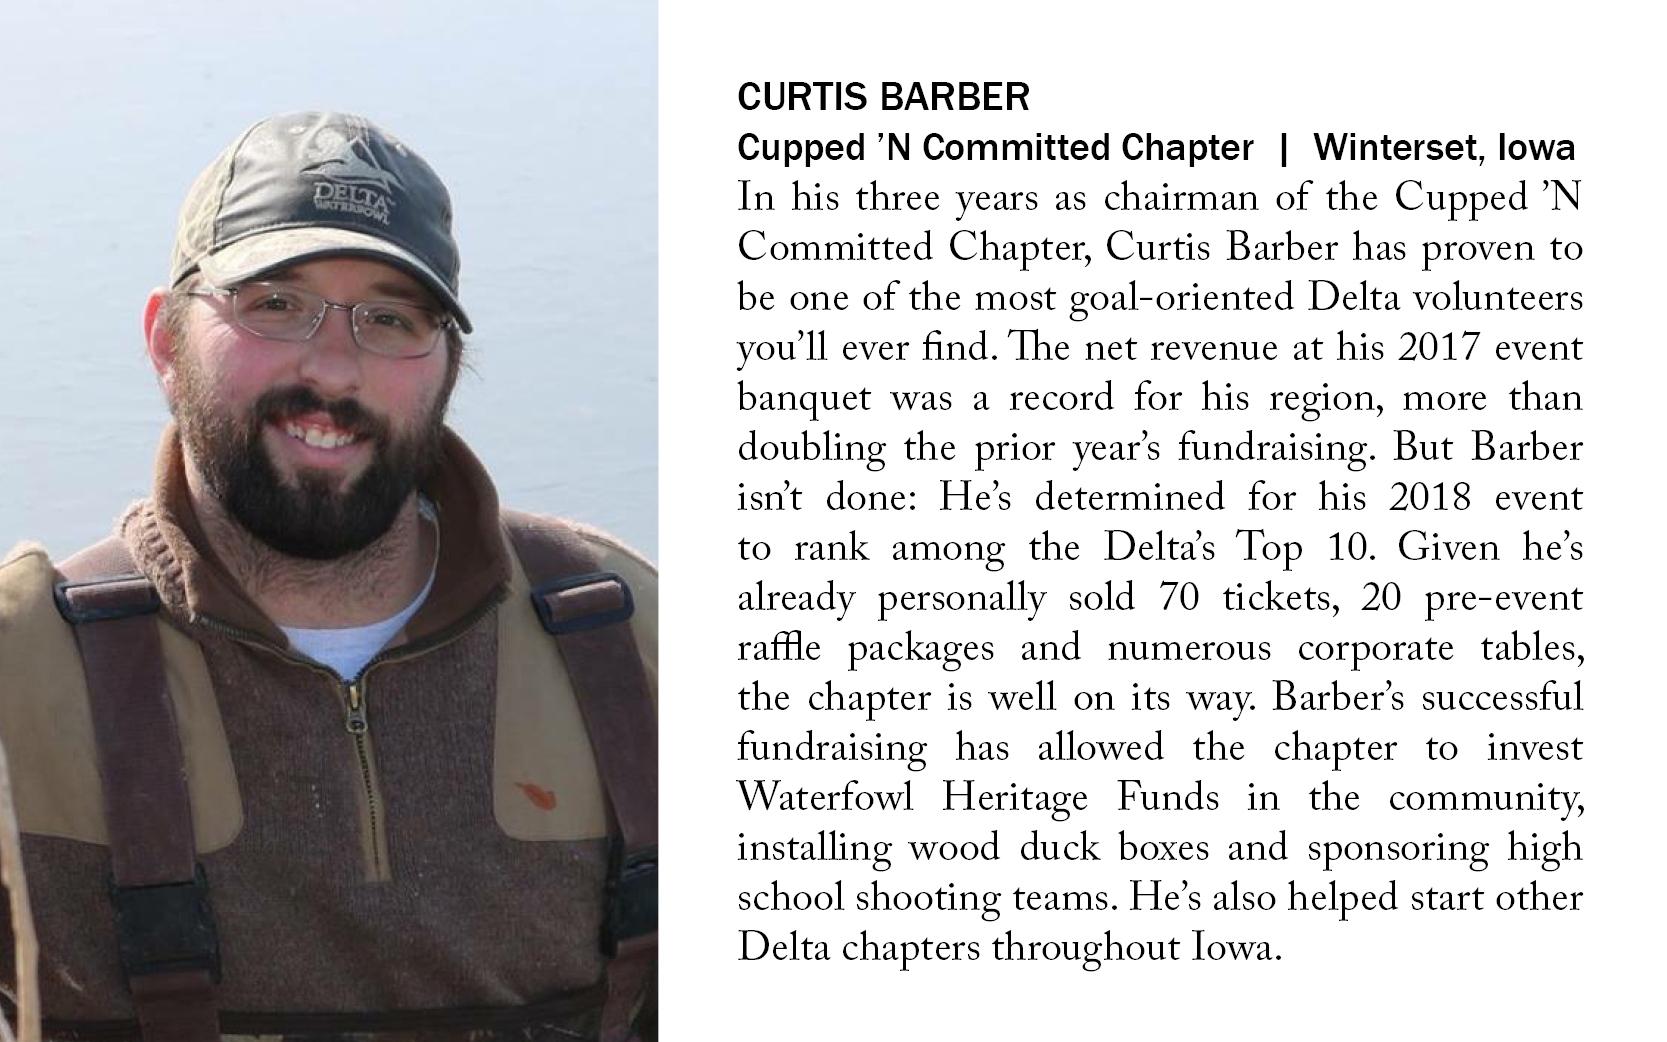 CurtisBarber.jpg